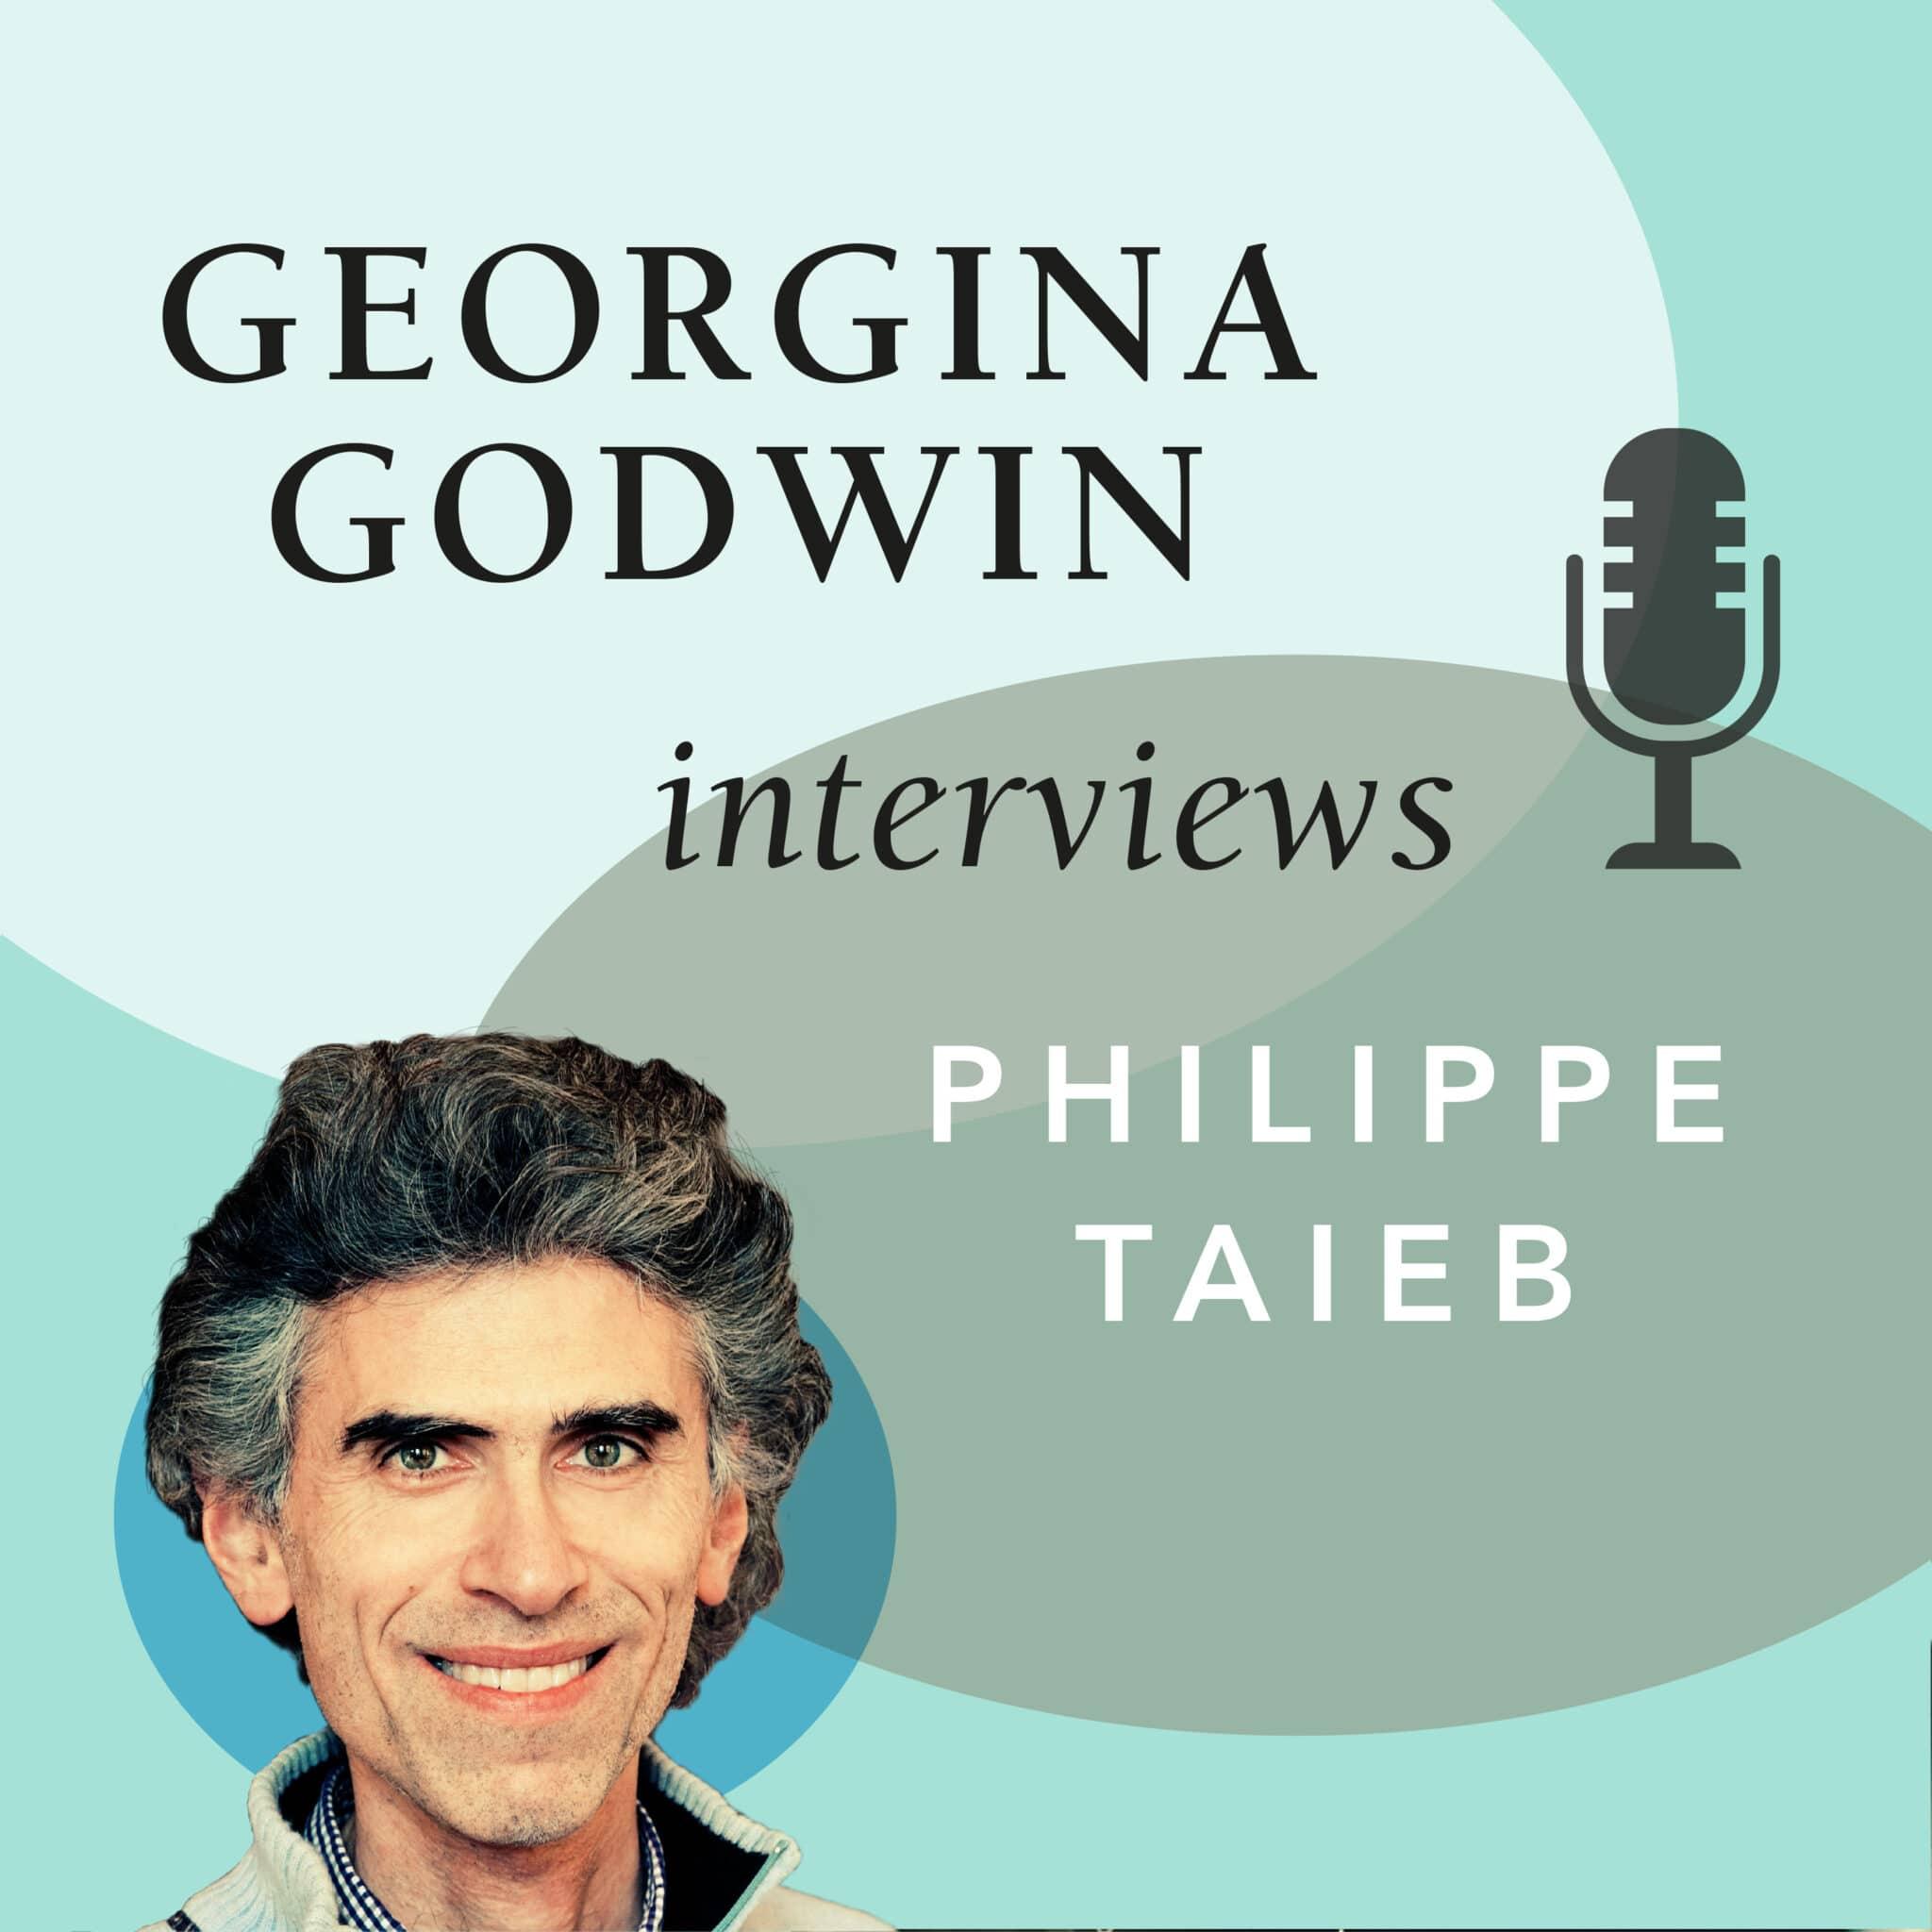 Georgina Godwin interviews Philippe Taieb